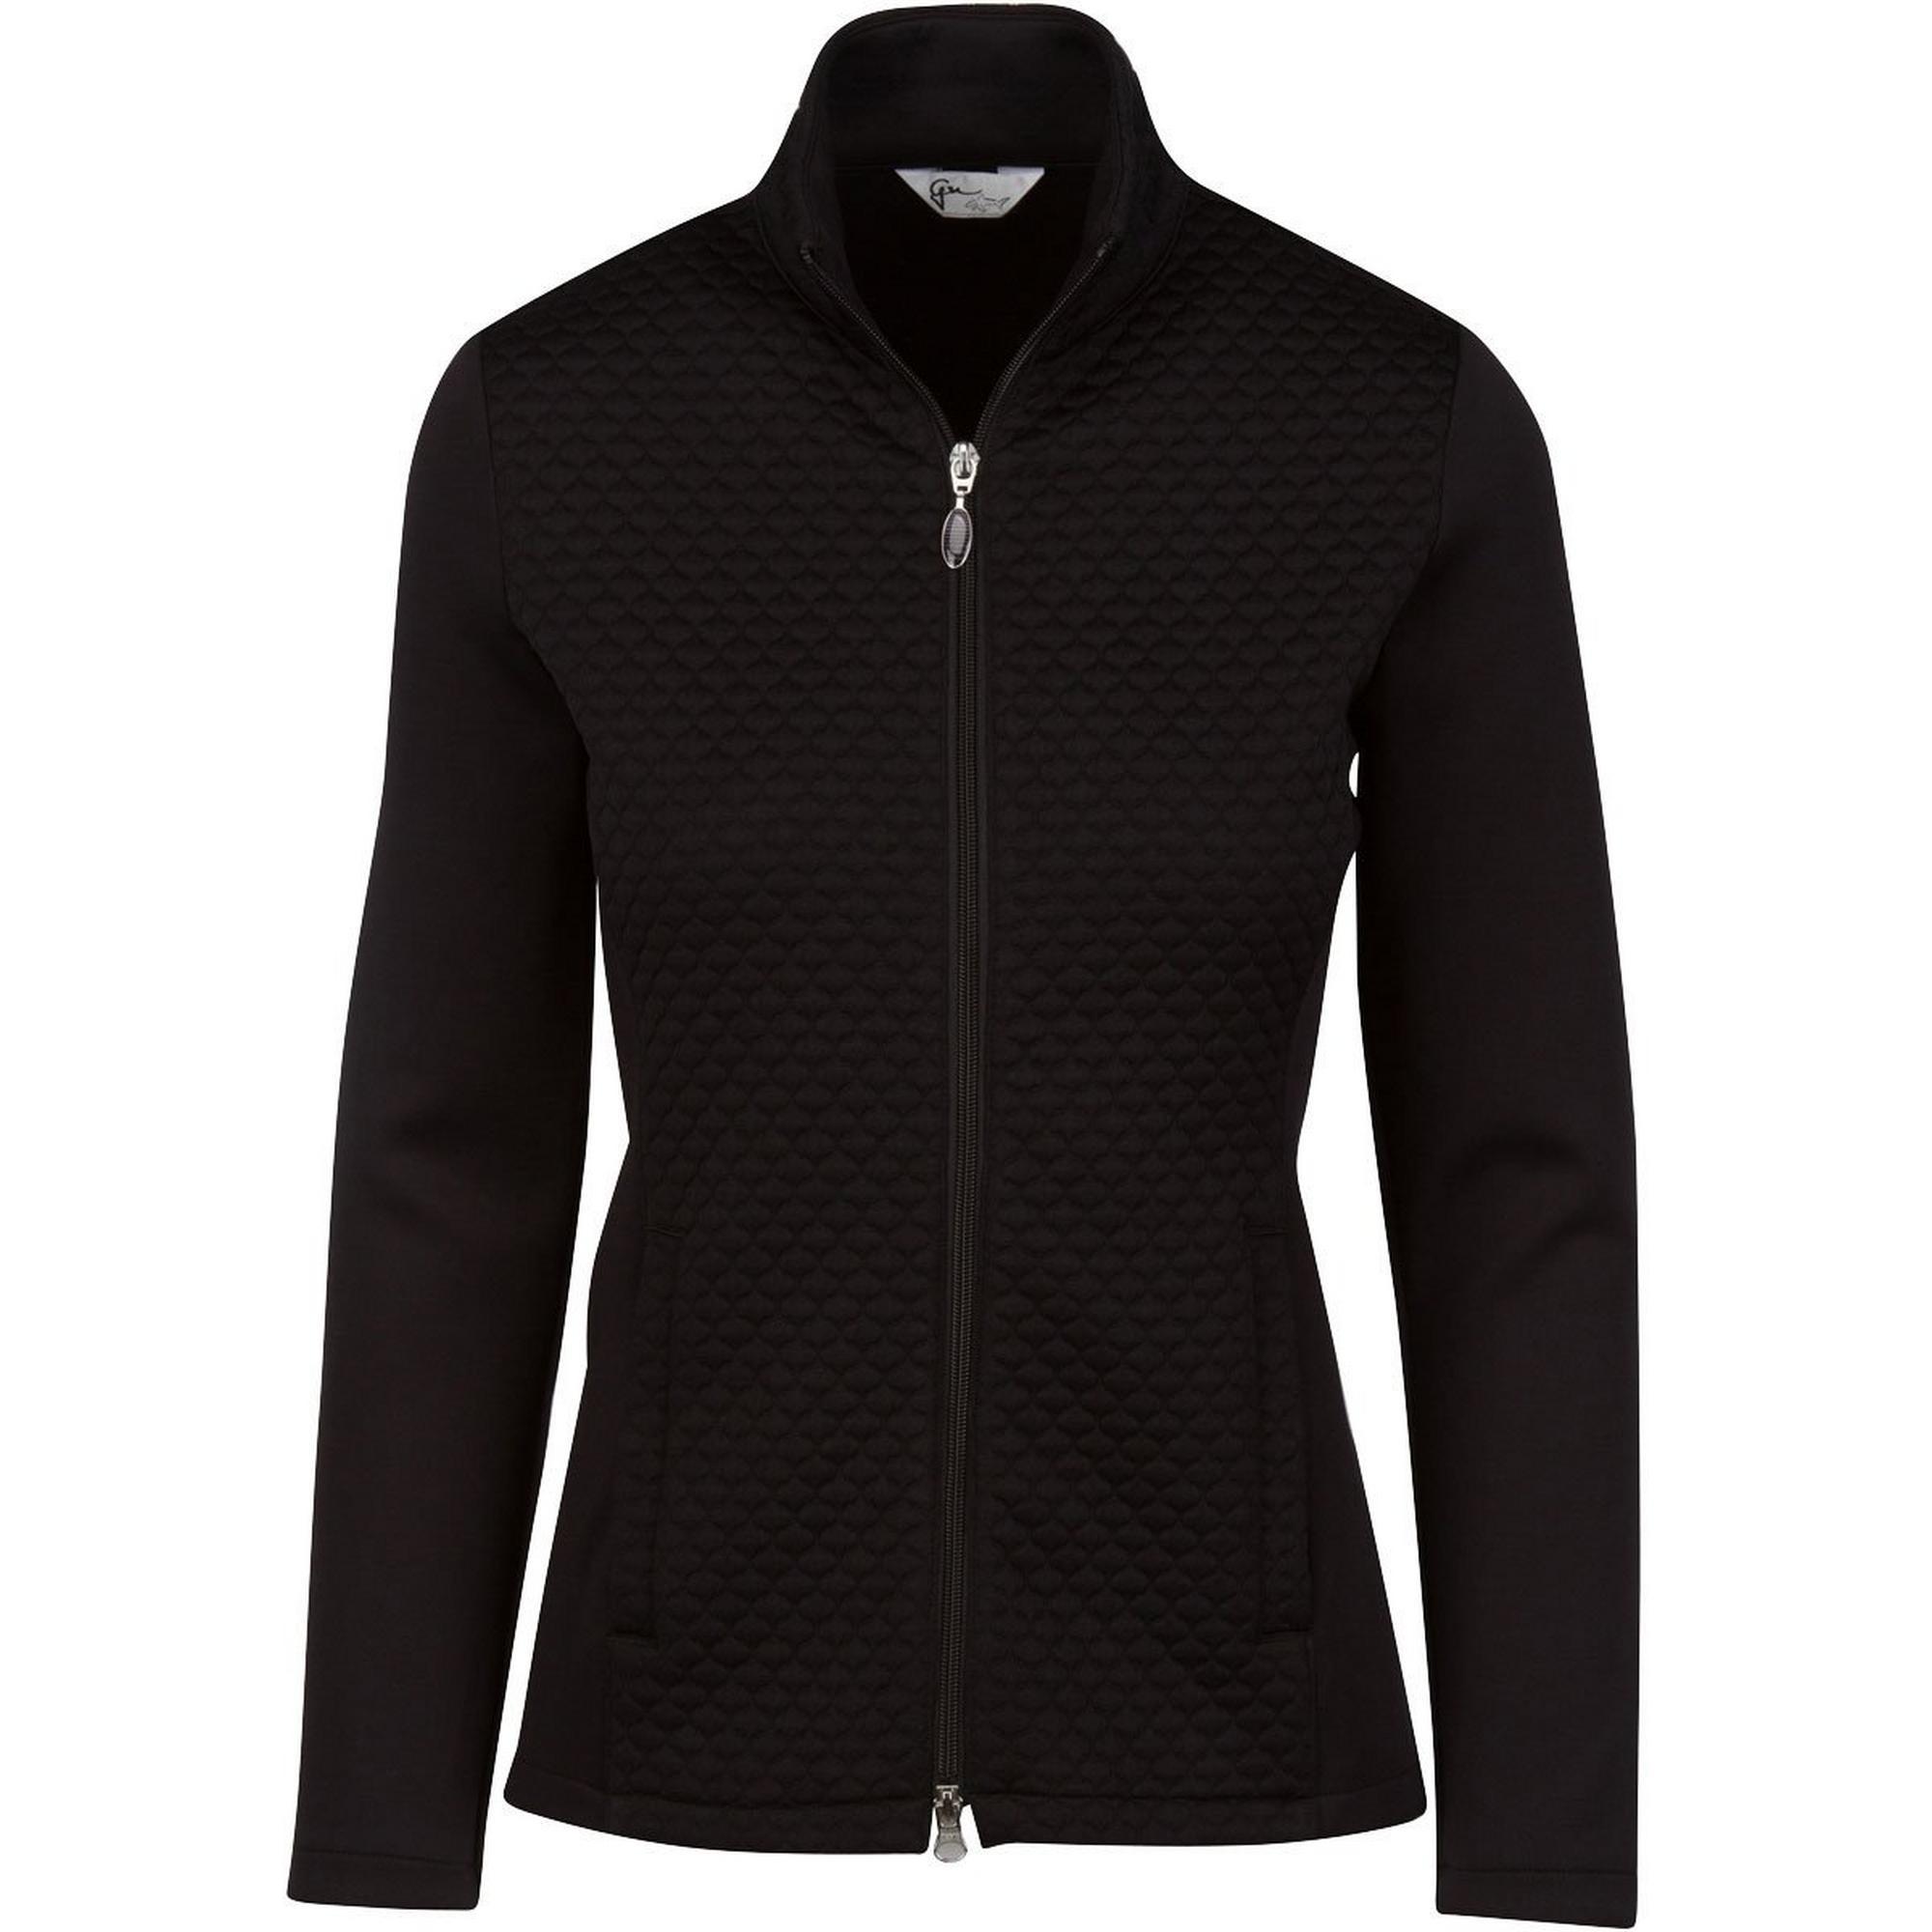 Women's Jacquard Knit Jacket